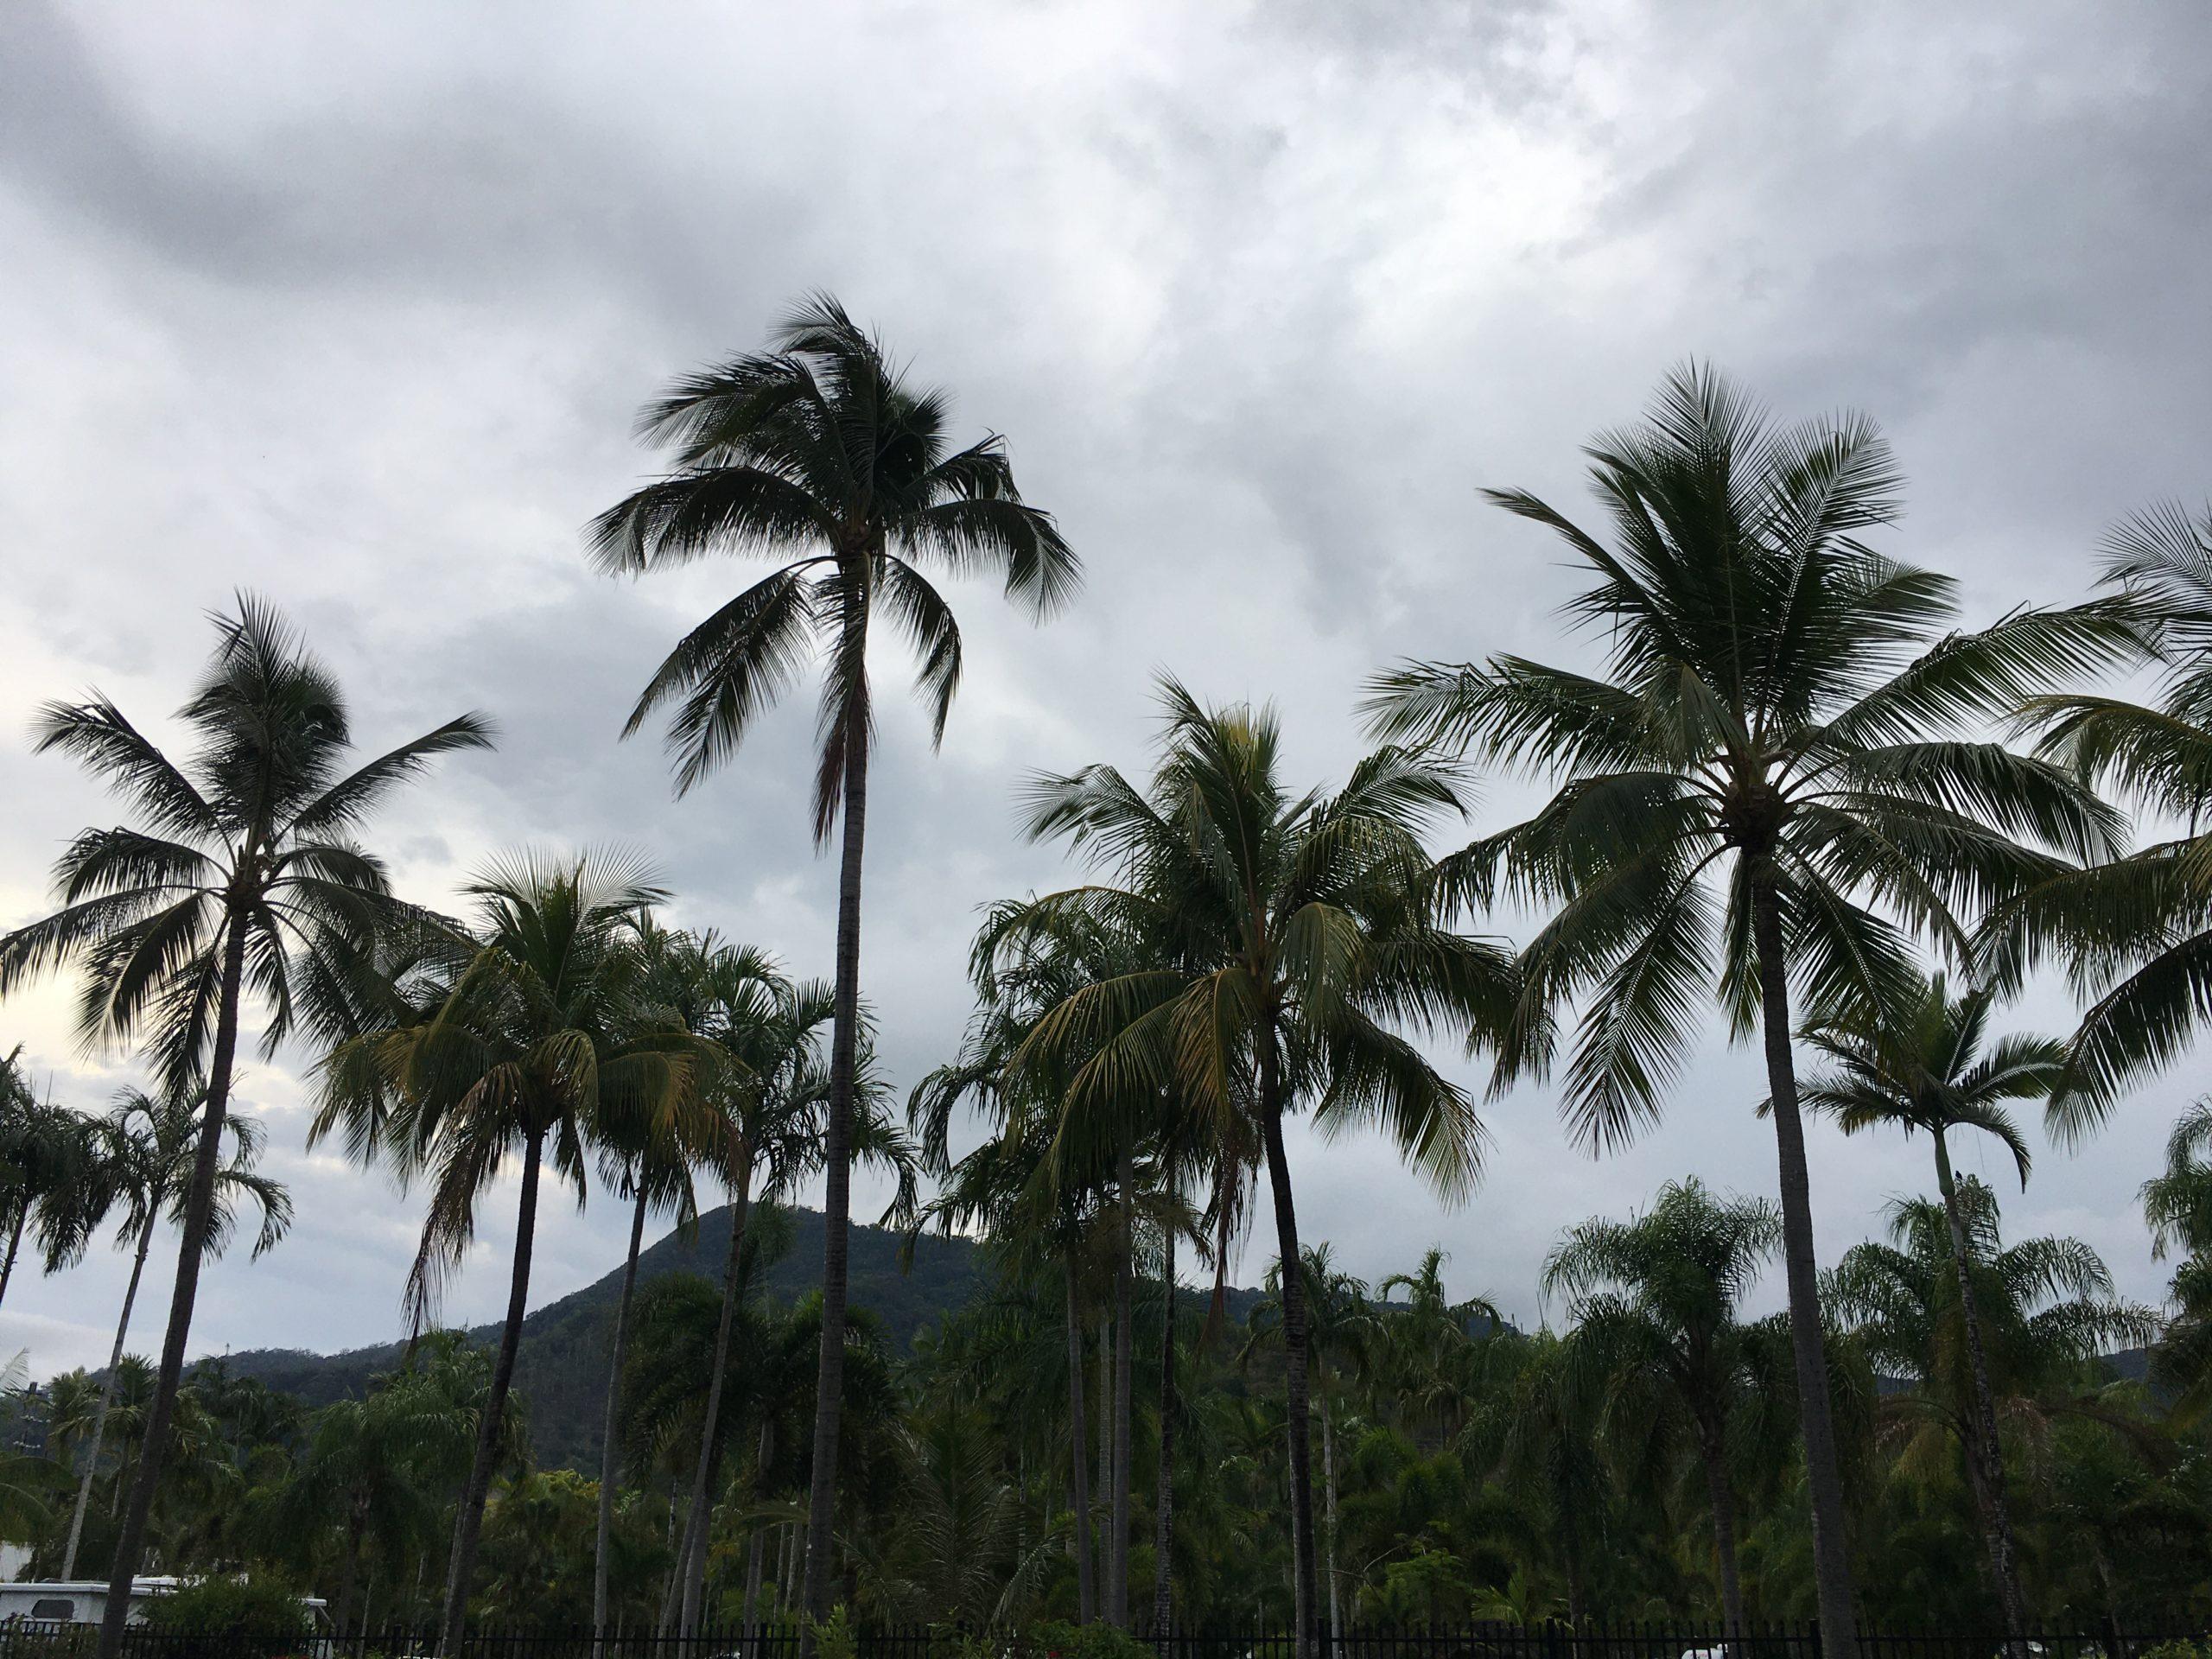 Sonntag 15.Dezember, Ankunft in Cairns